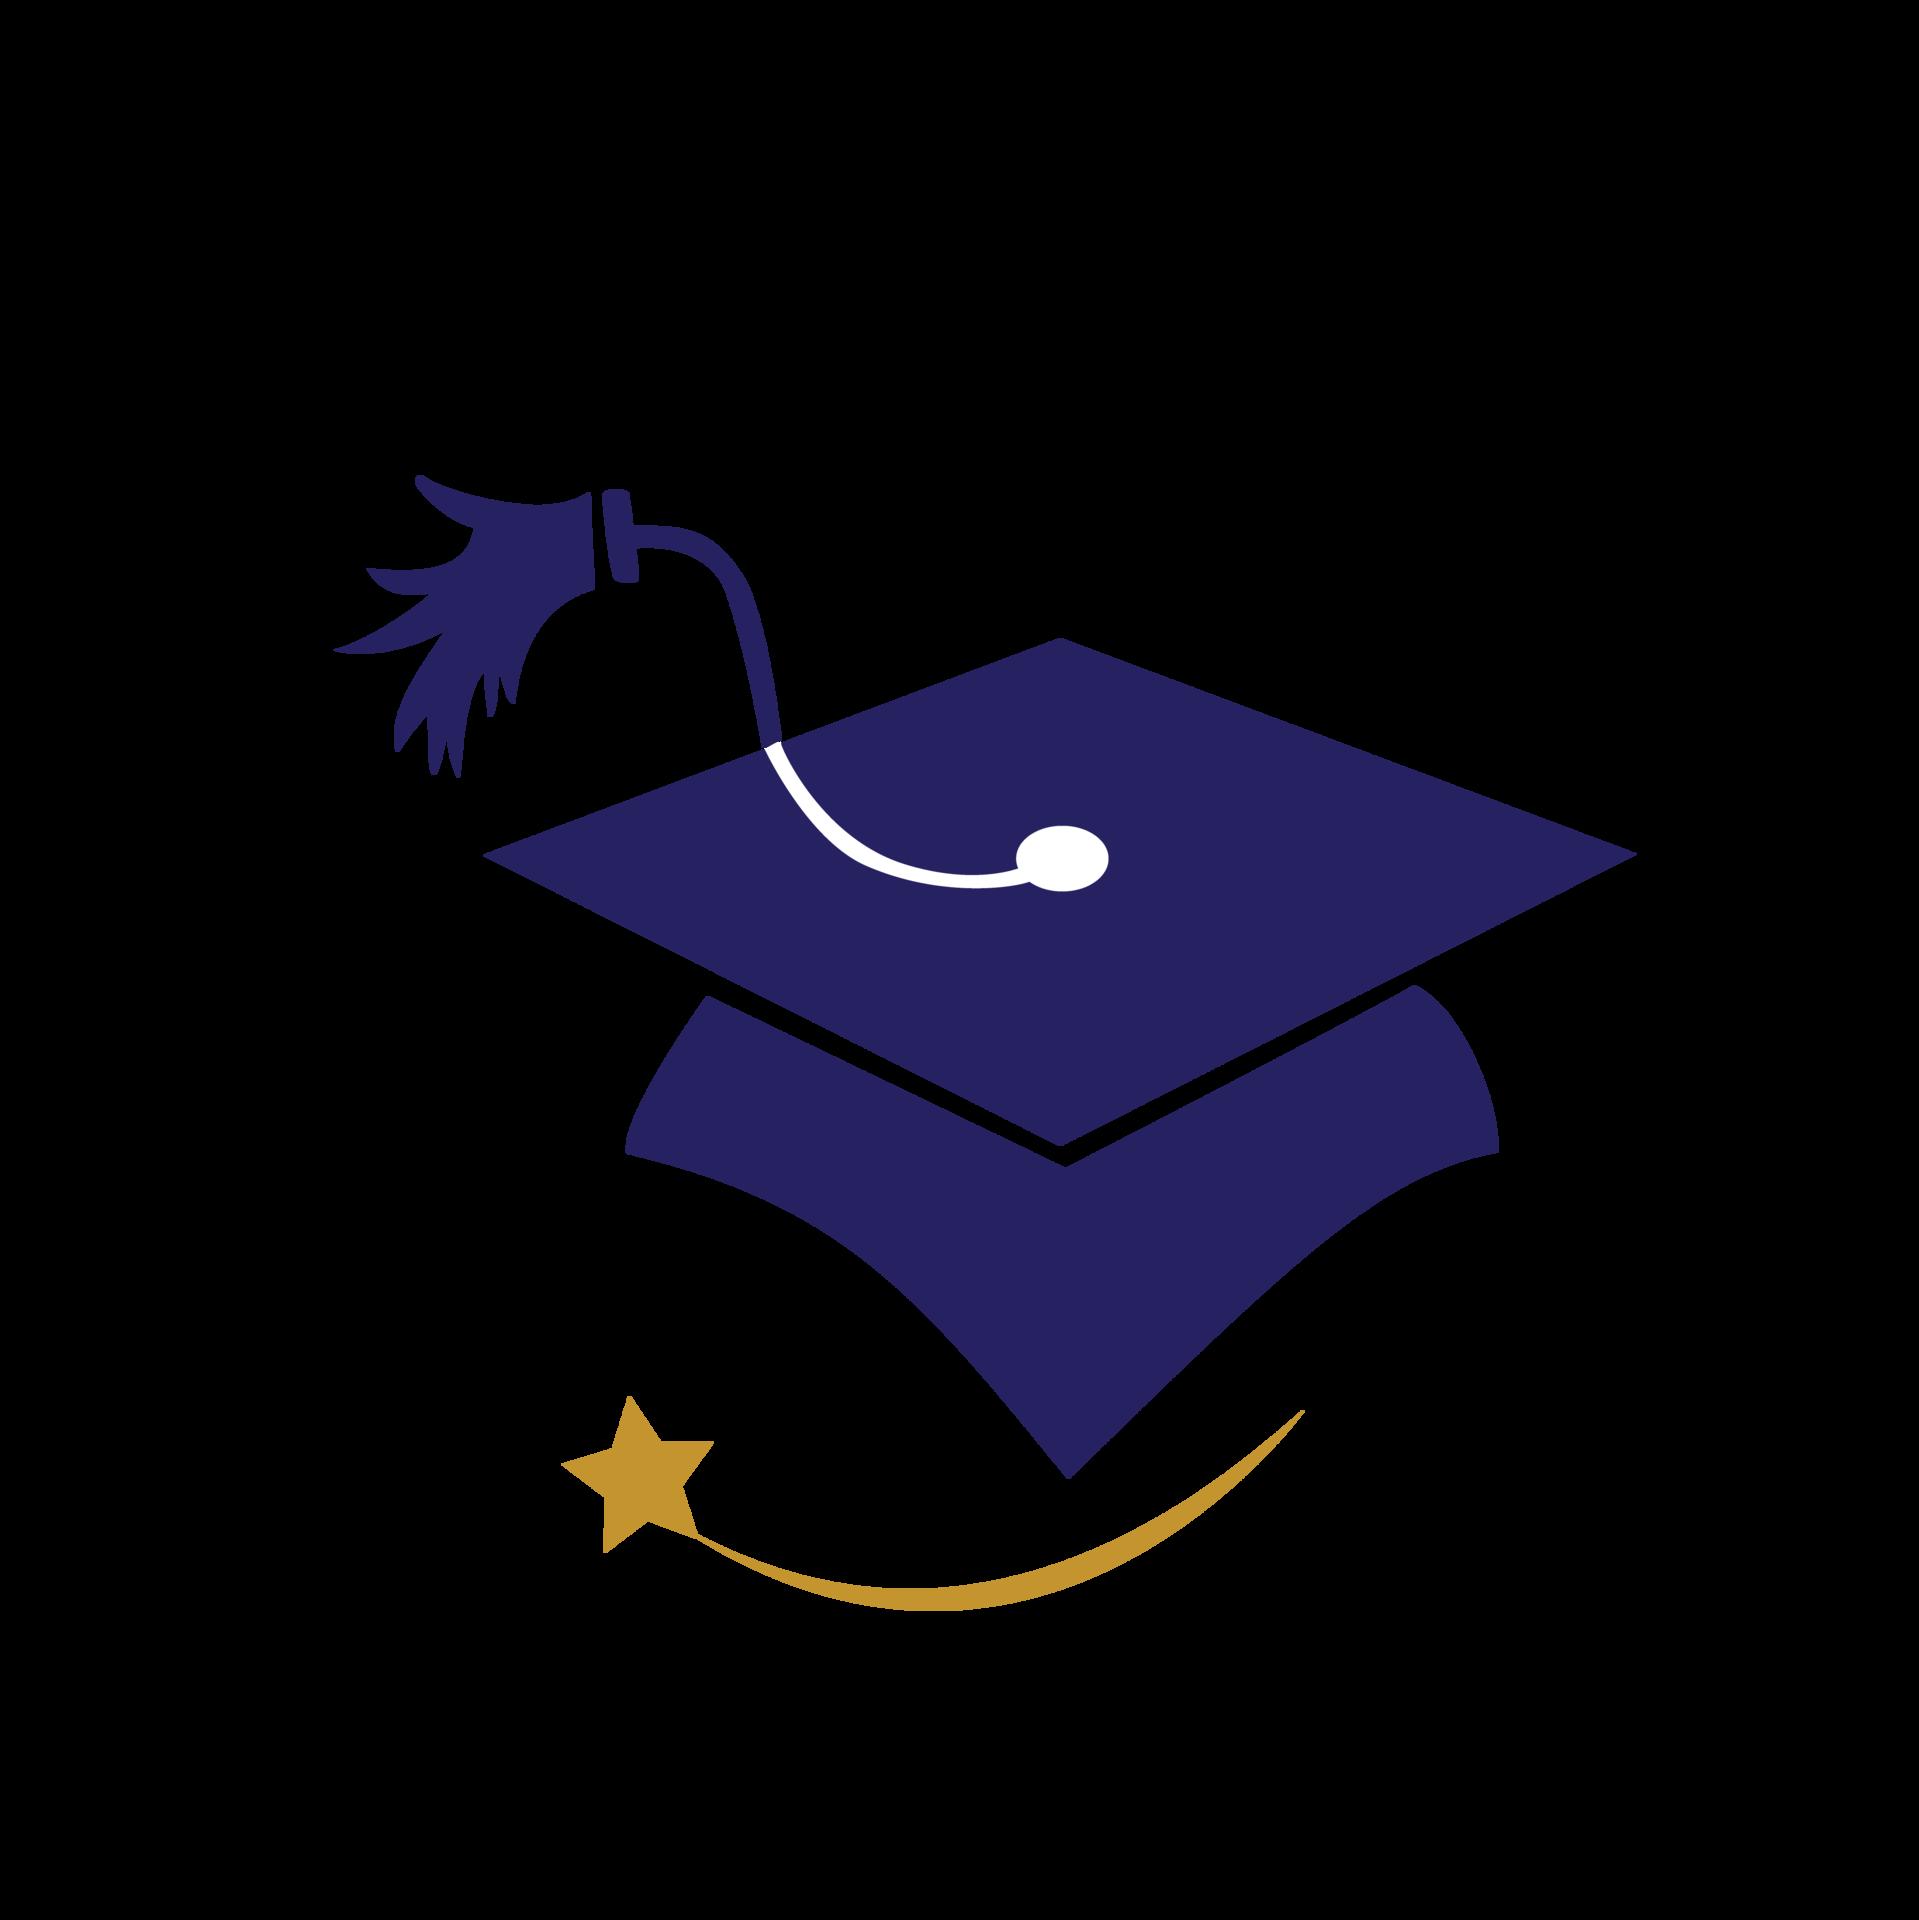 Tetzlaff MS logo